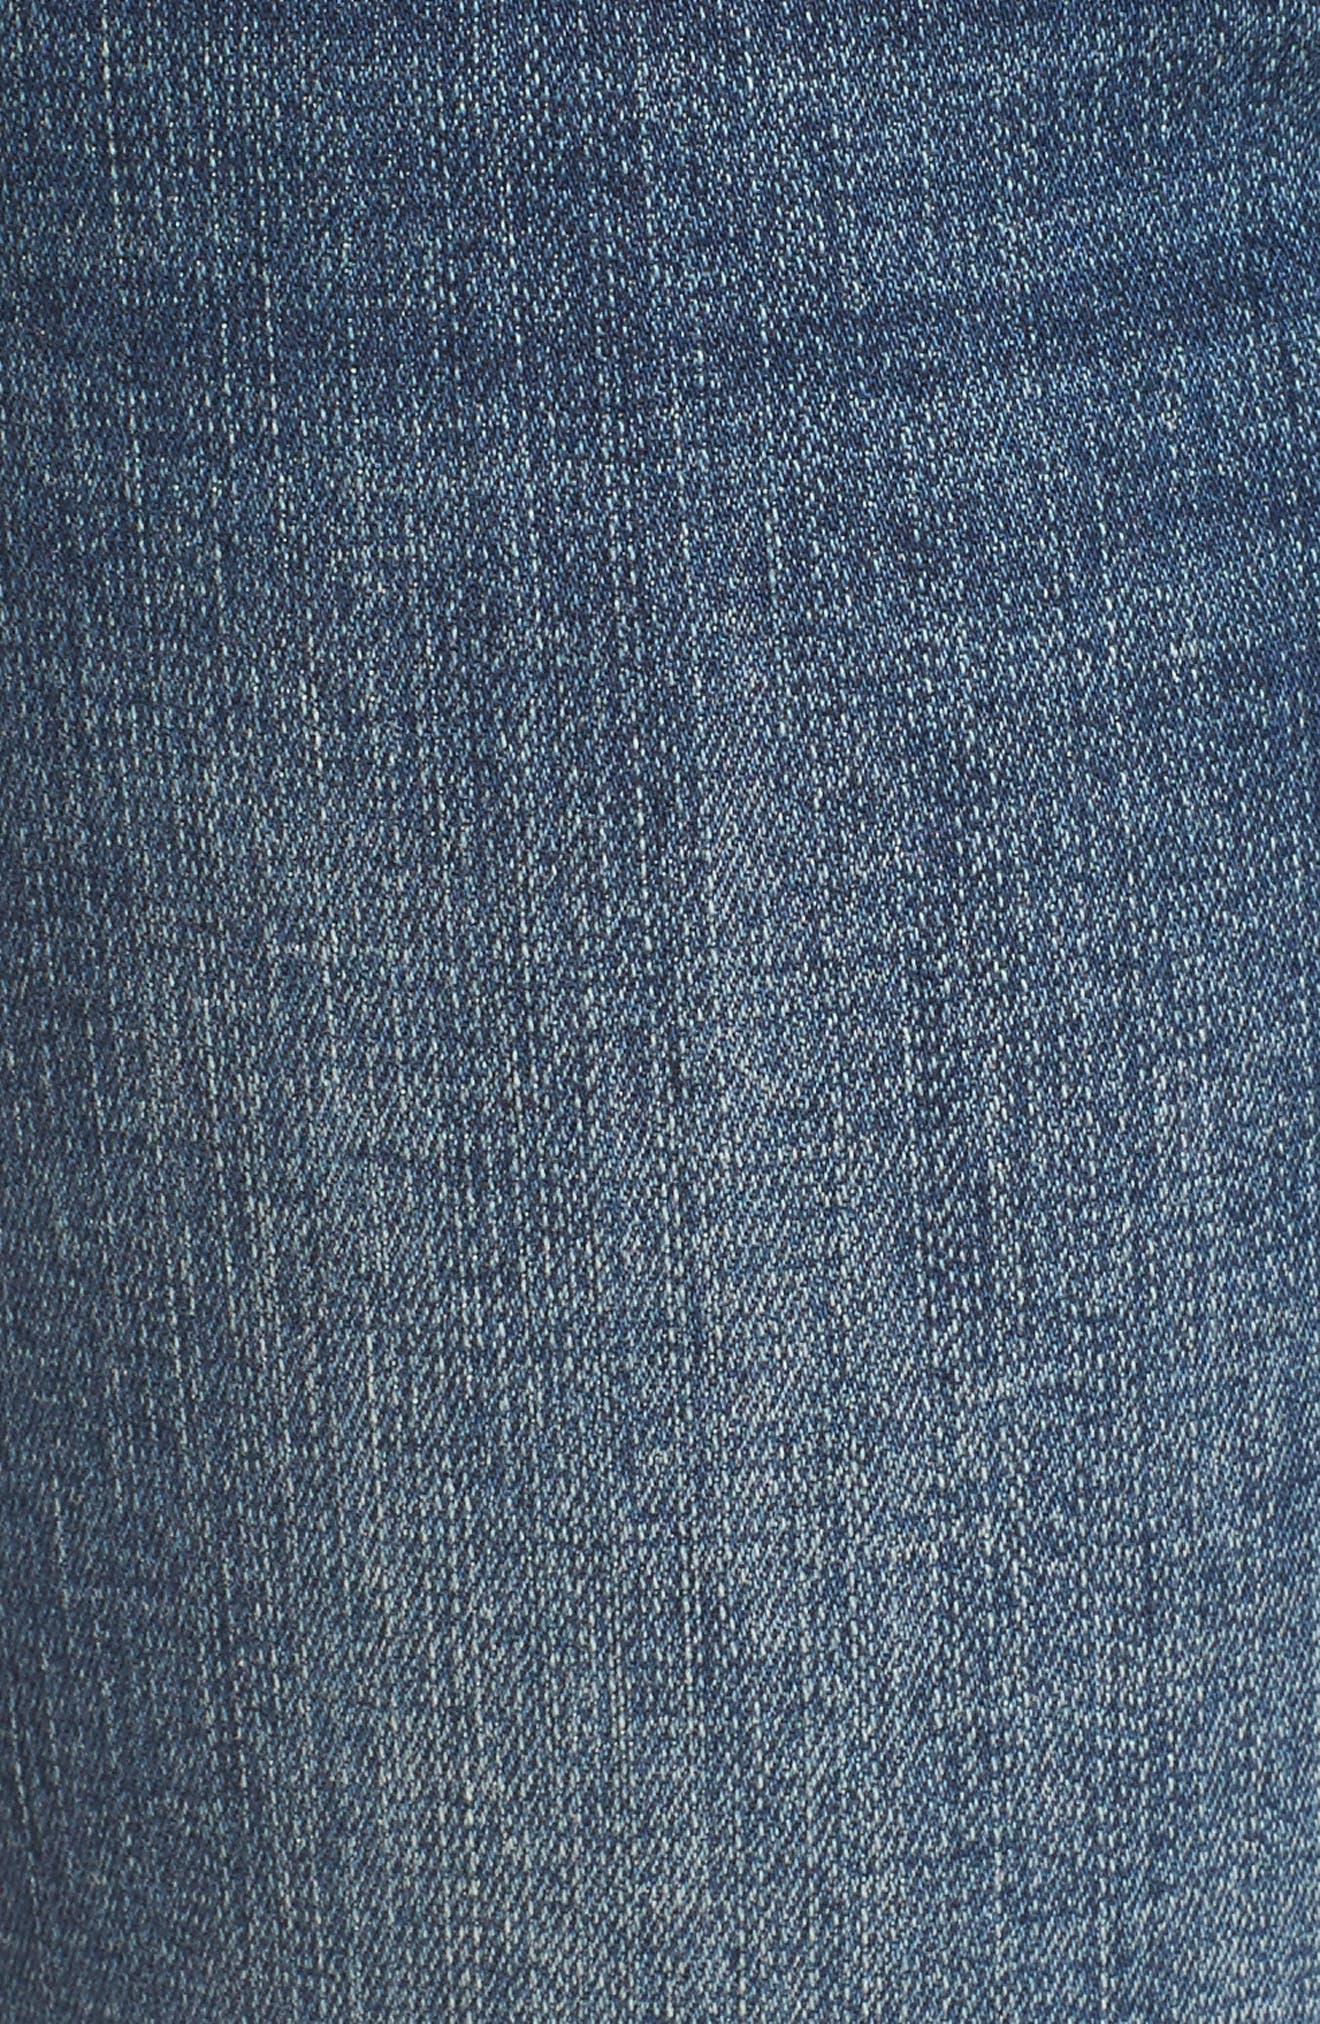 Alternate Image 5  - Wit & Wisdom Flex-ellent Embroidered Boyfriend Jeans (Nordstrom Exclusive) (Regular & Petite)